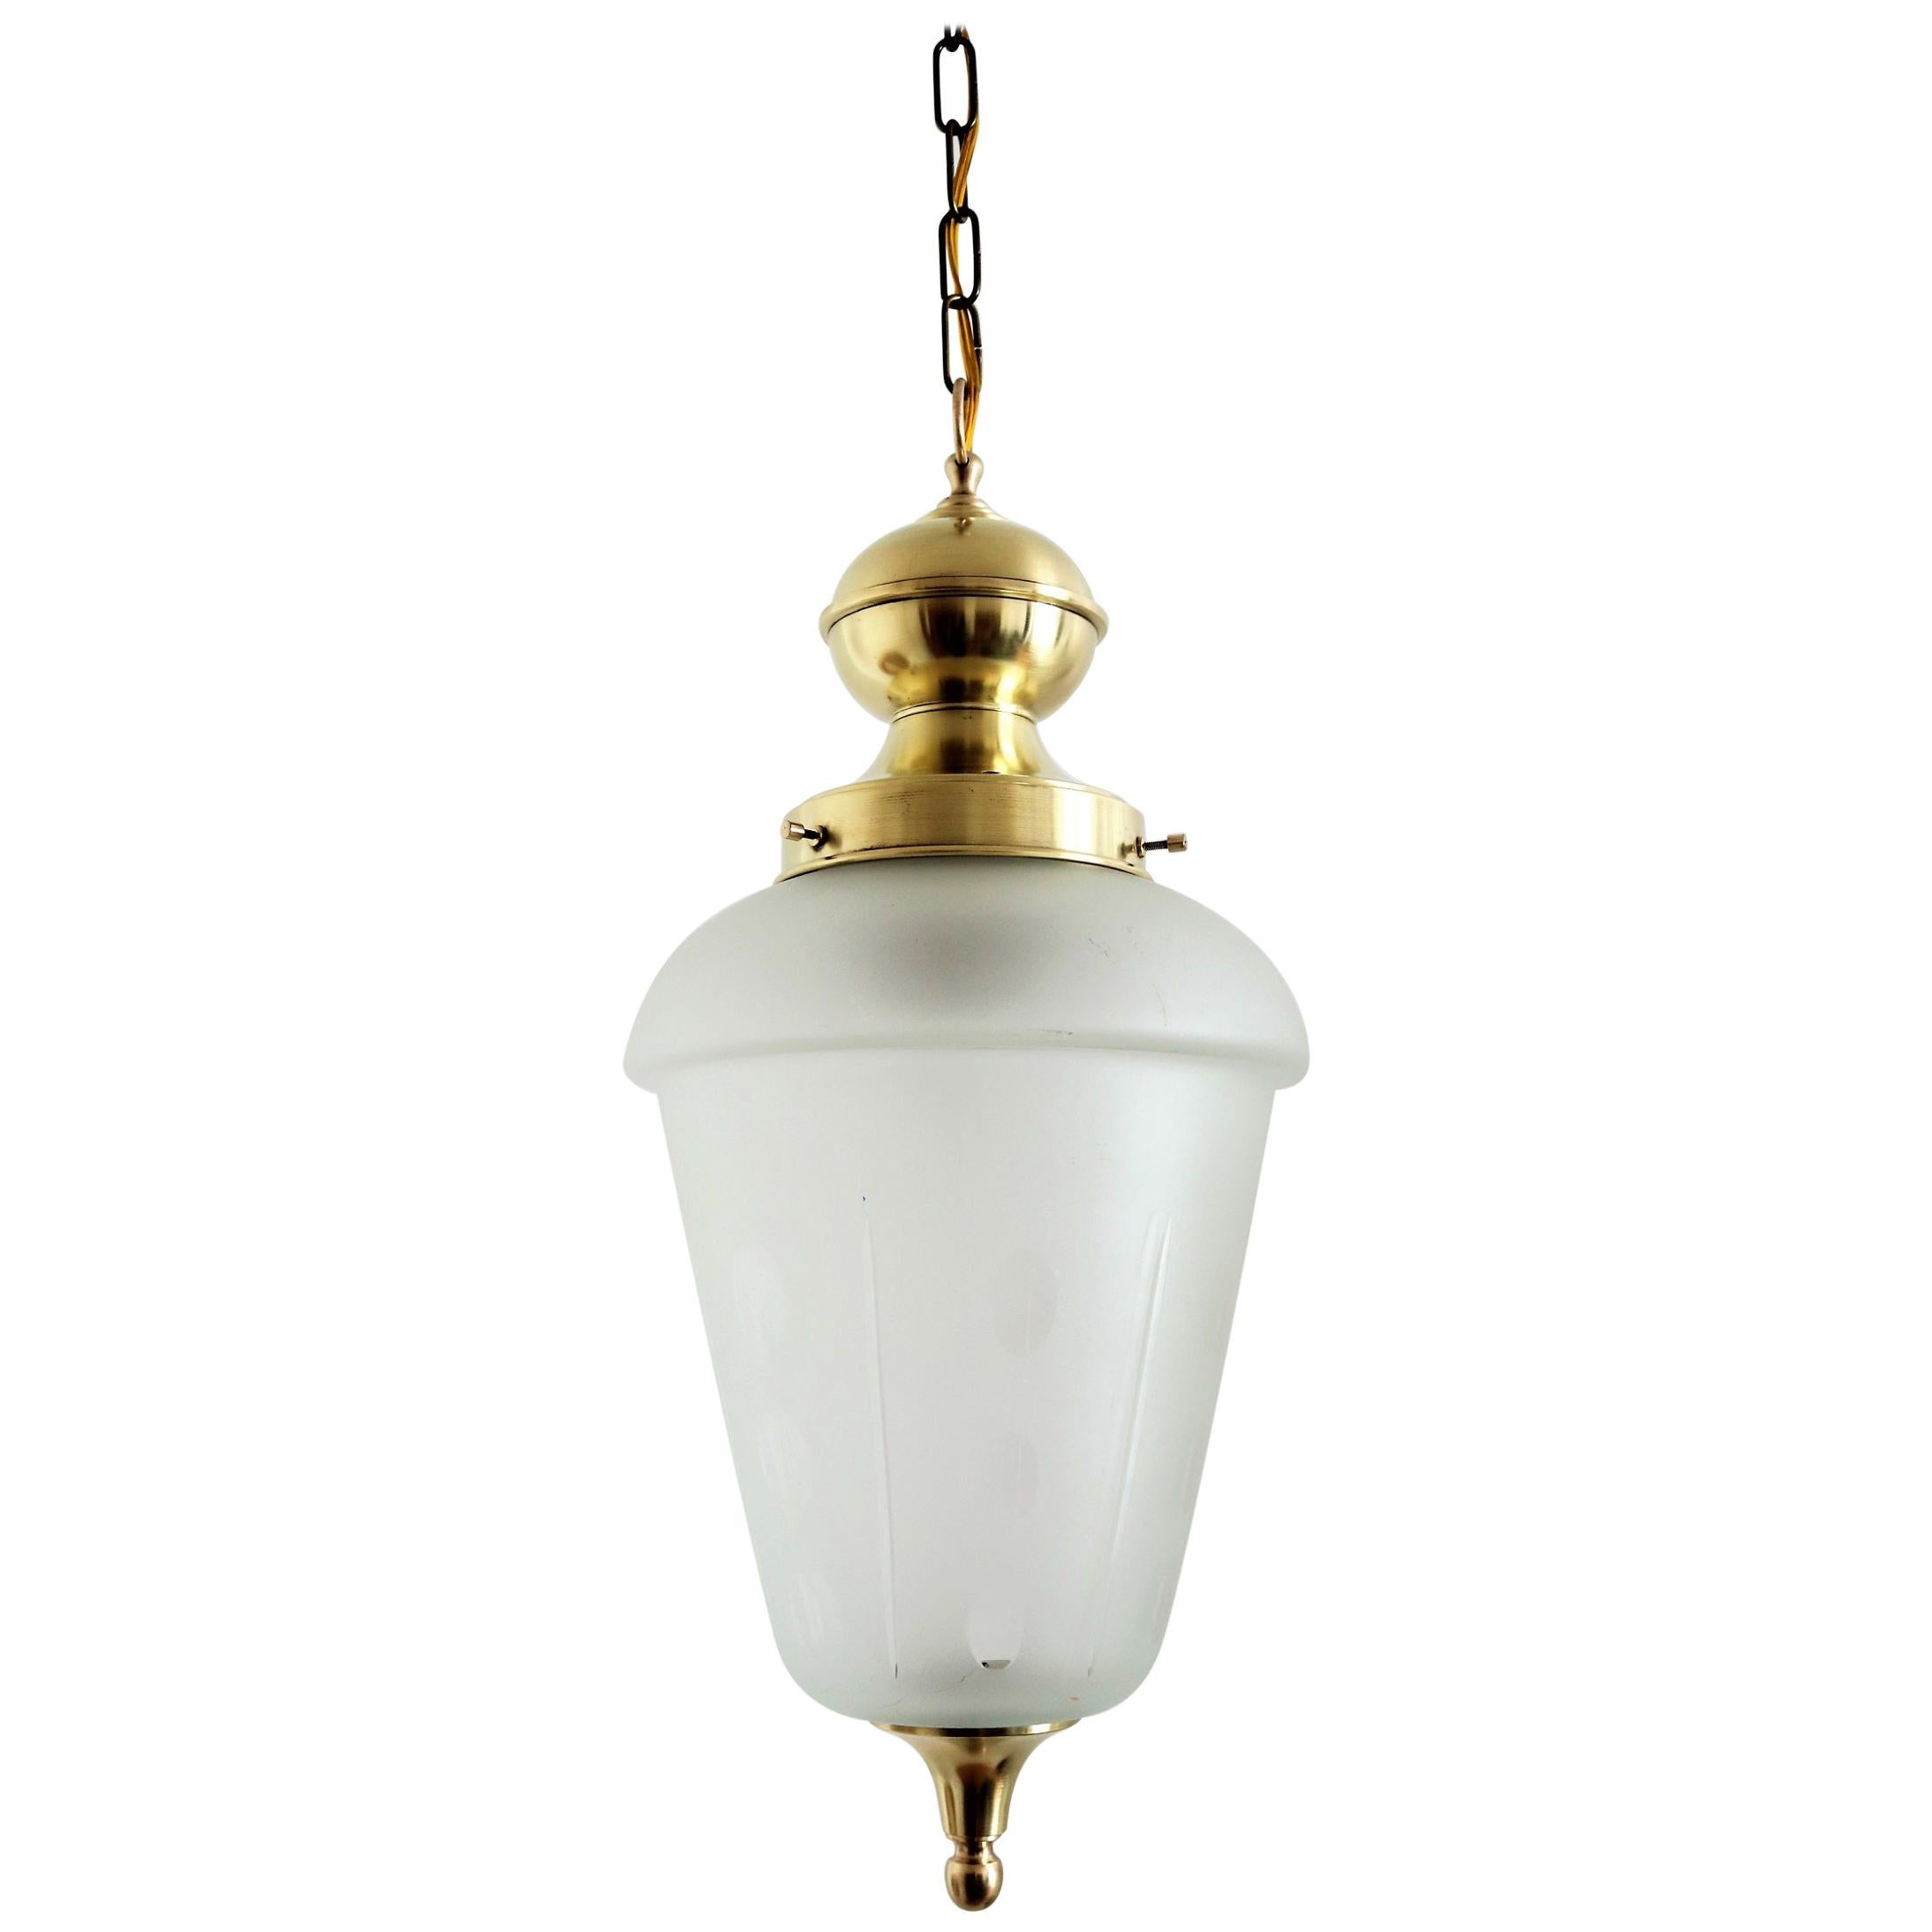 Italian Midcentury Brass and Cut Glass Pendant Lamp or Lantern, 1970s